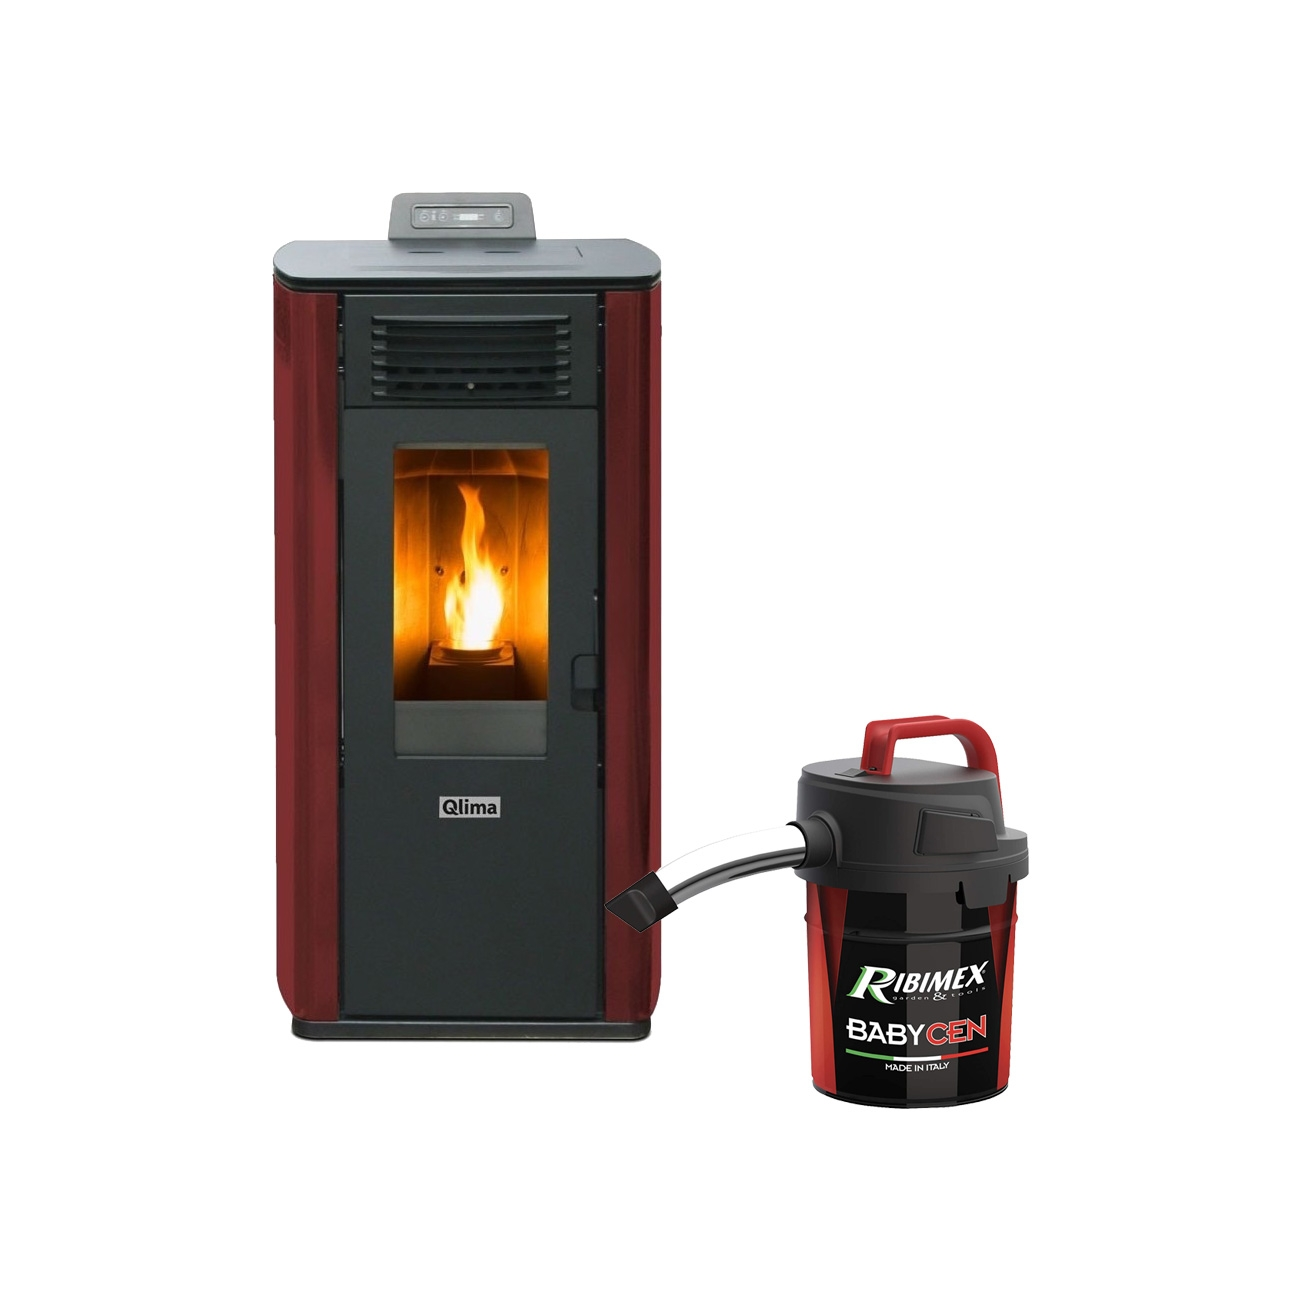 Qlima Fiorina 90 S-LINE Red Pellet stove 10.1 kW